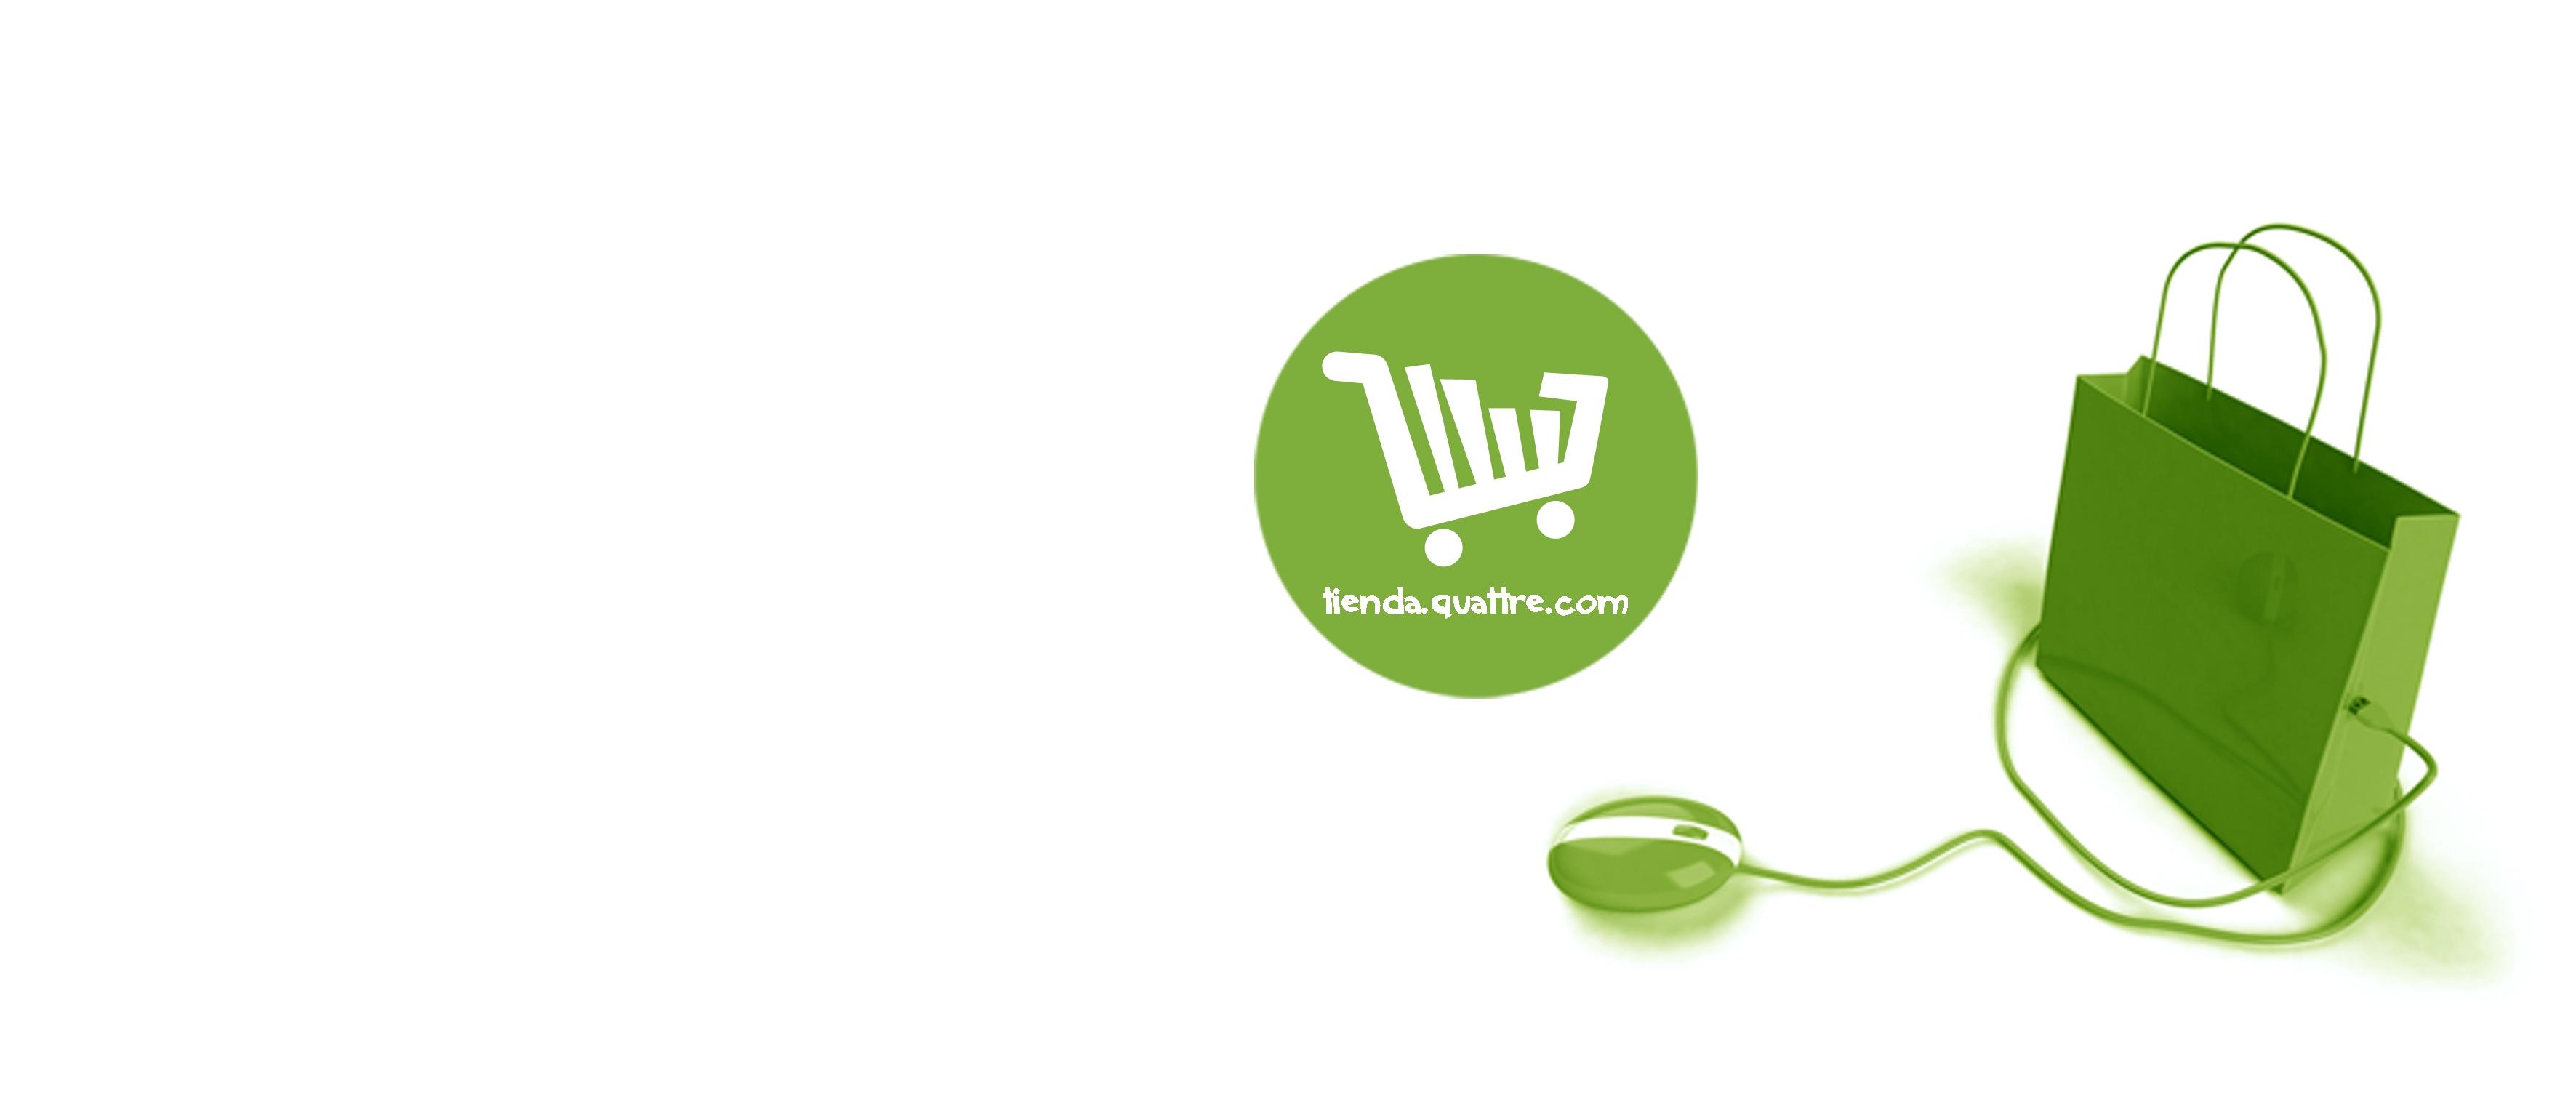 f9fdbfc2b7 La nueva tienda online